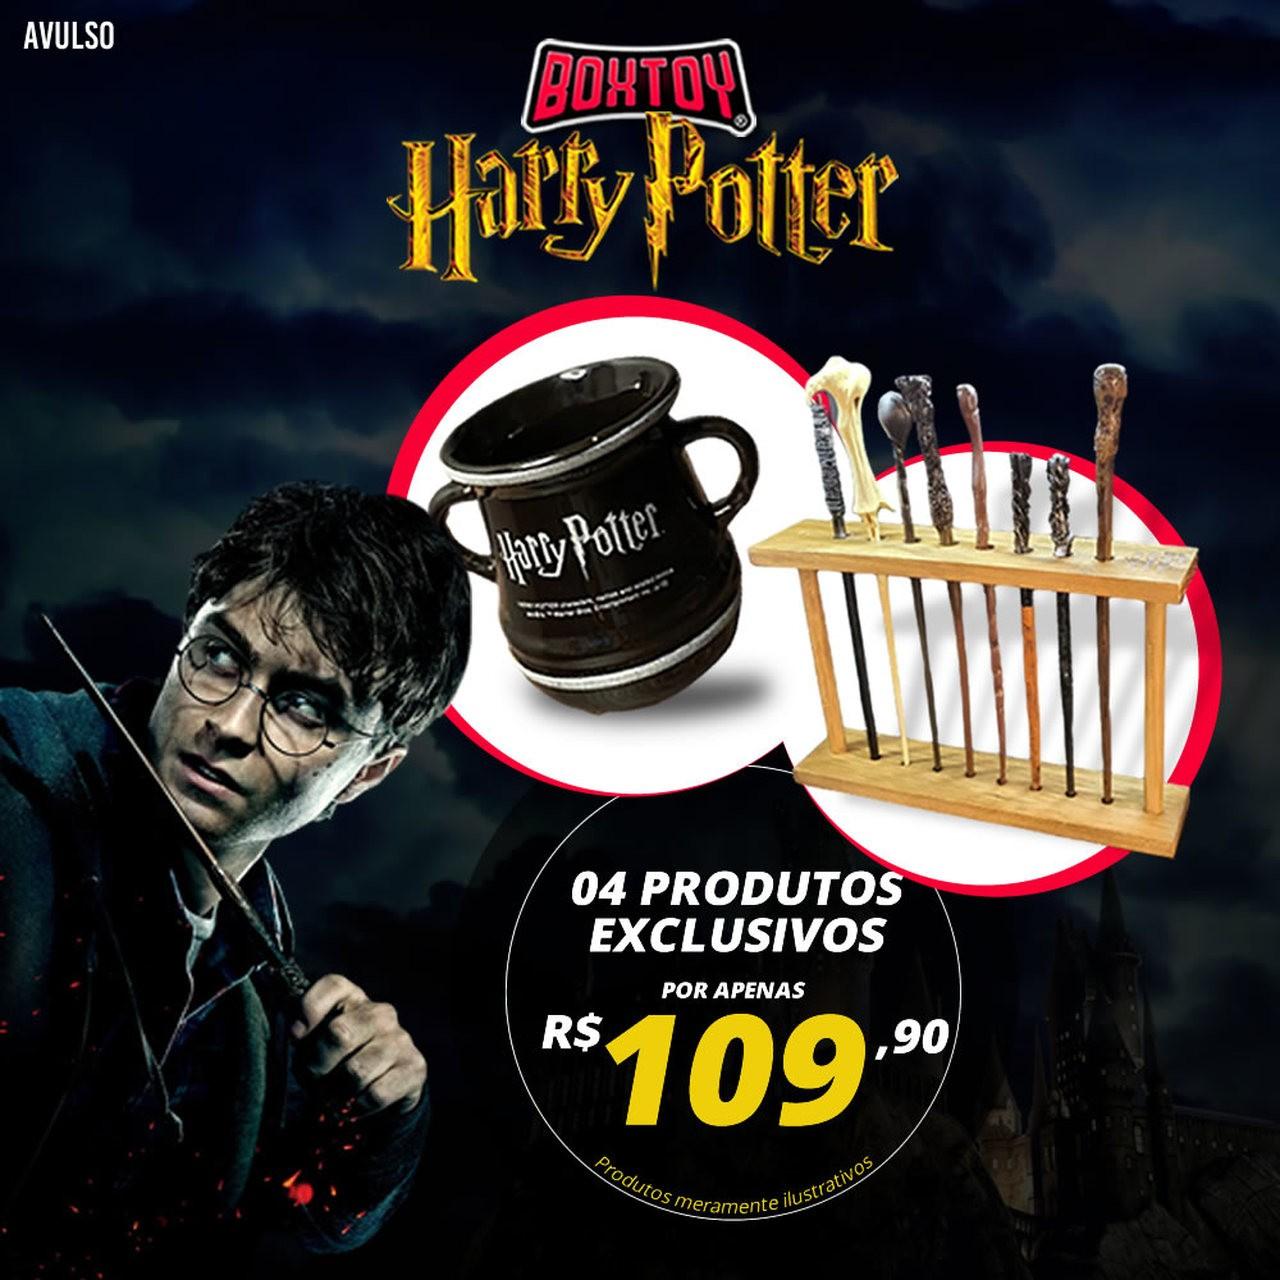 Boxtoy Edição Harry Potter  - Boxtoy